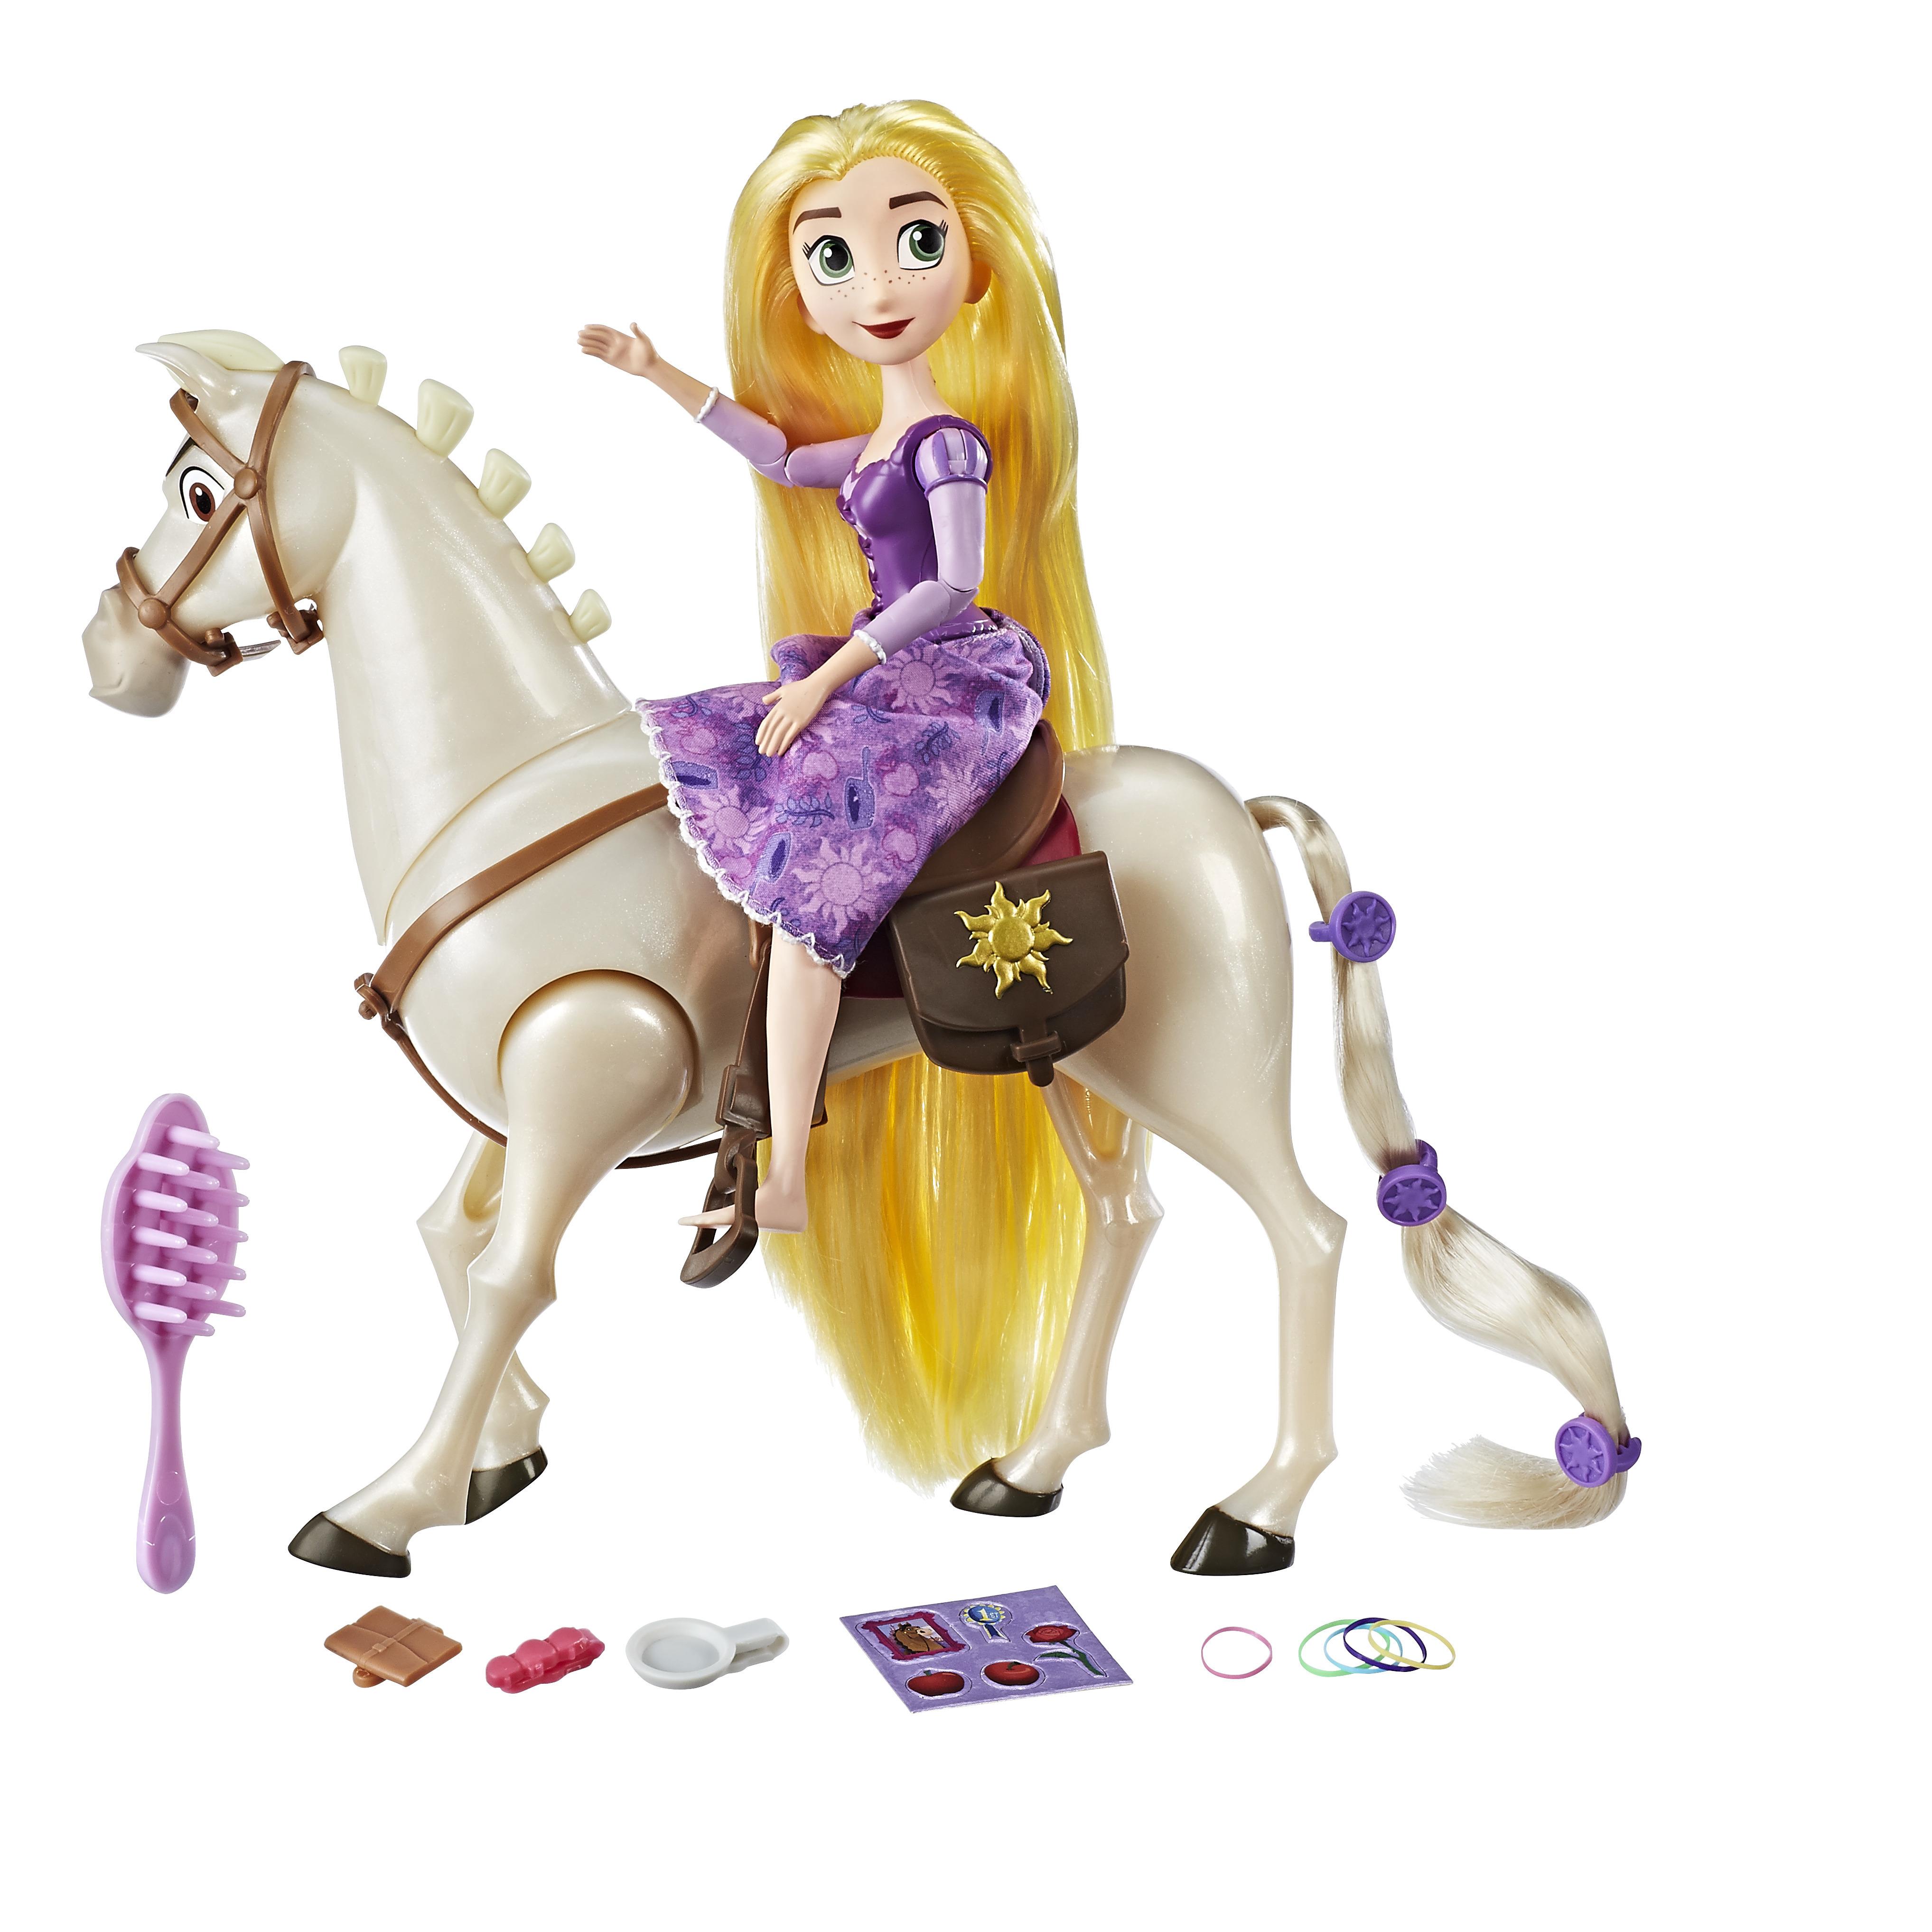 Disney princesses raiponce et maximus c2761eu40 pas - Raiponce maximus ...